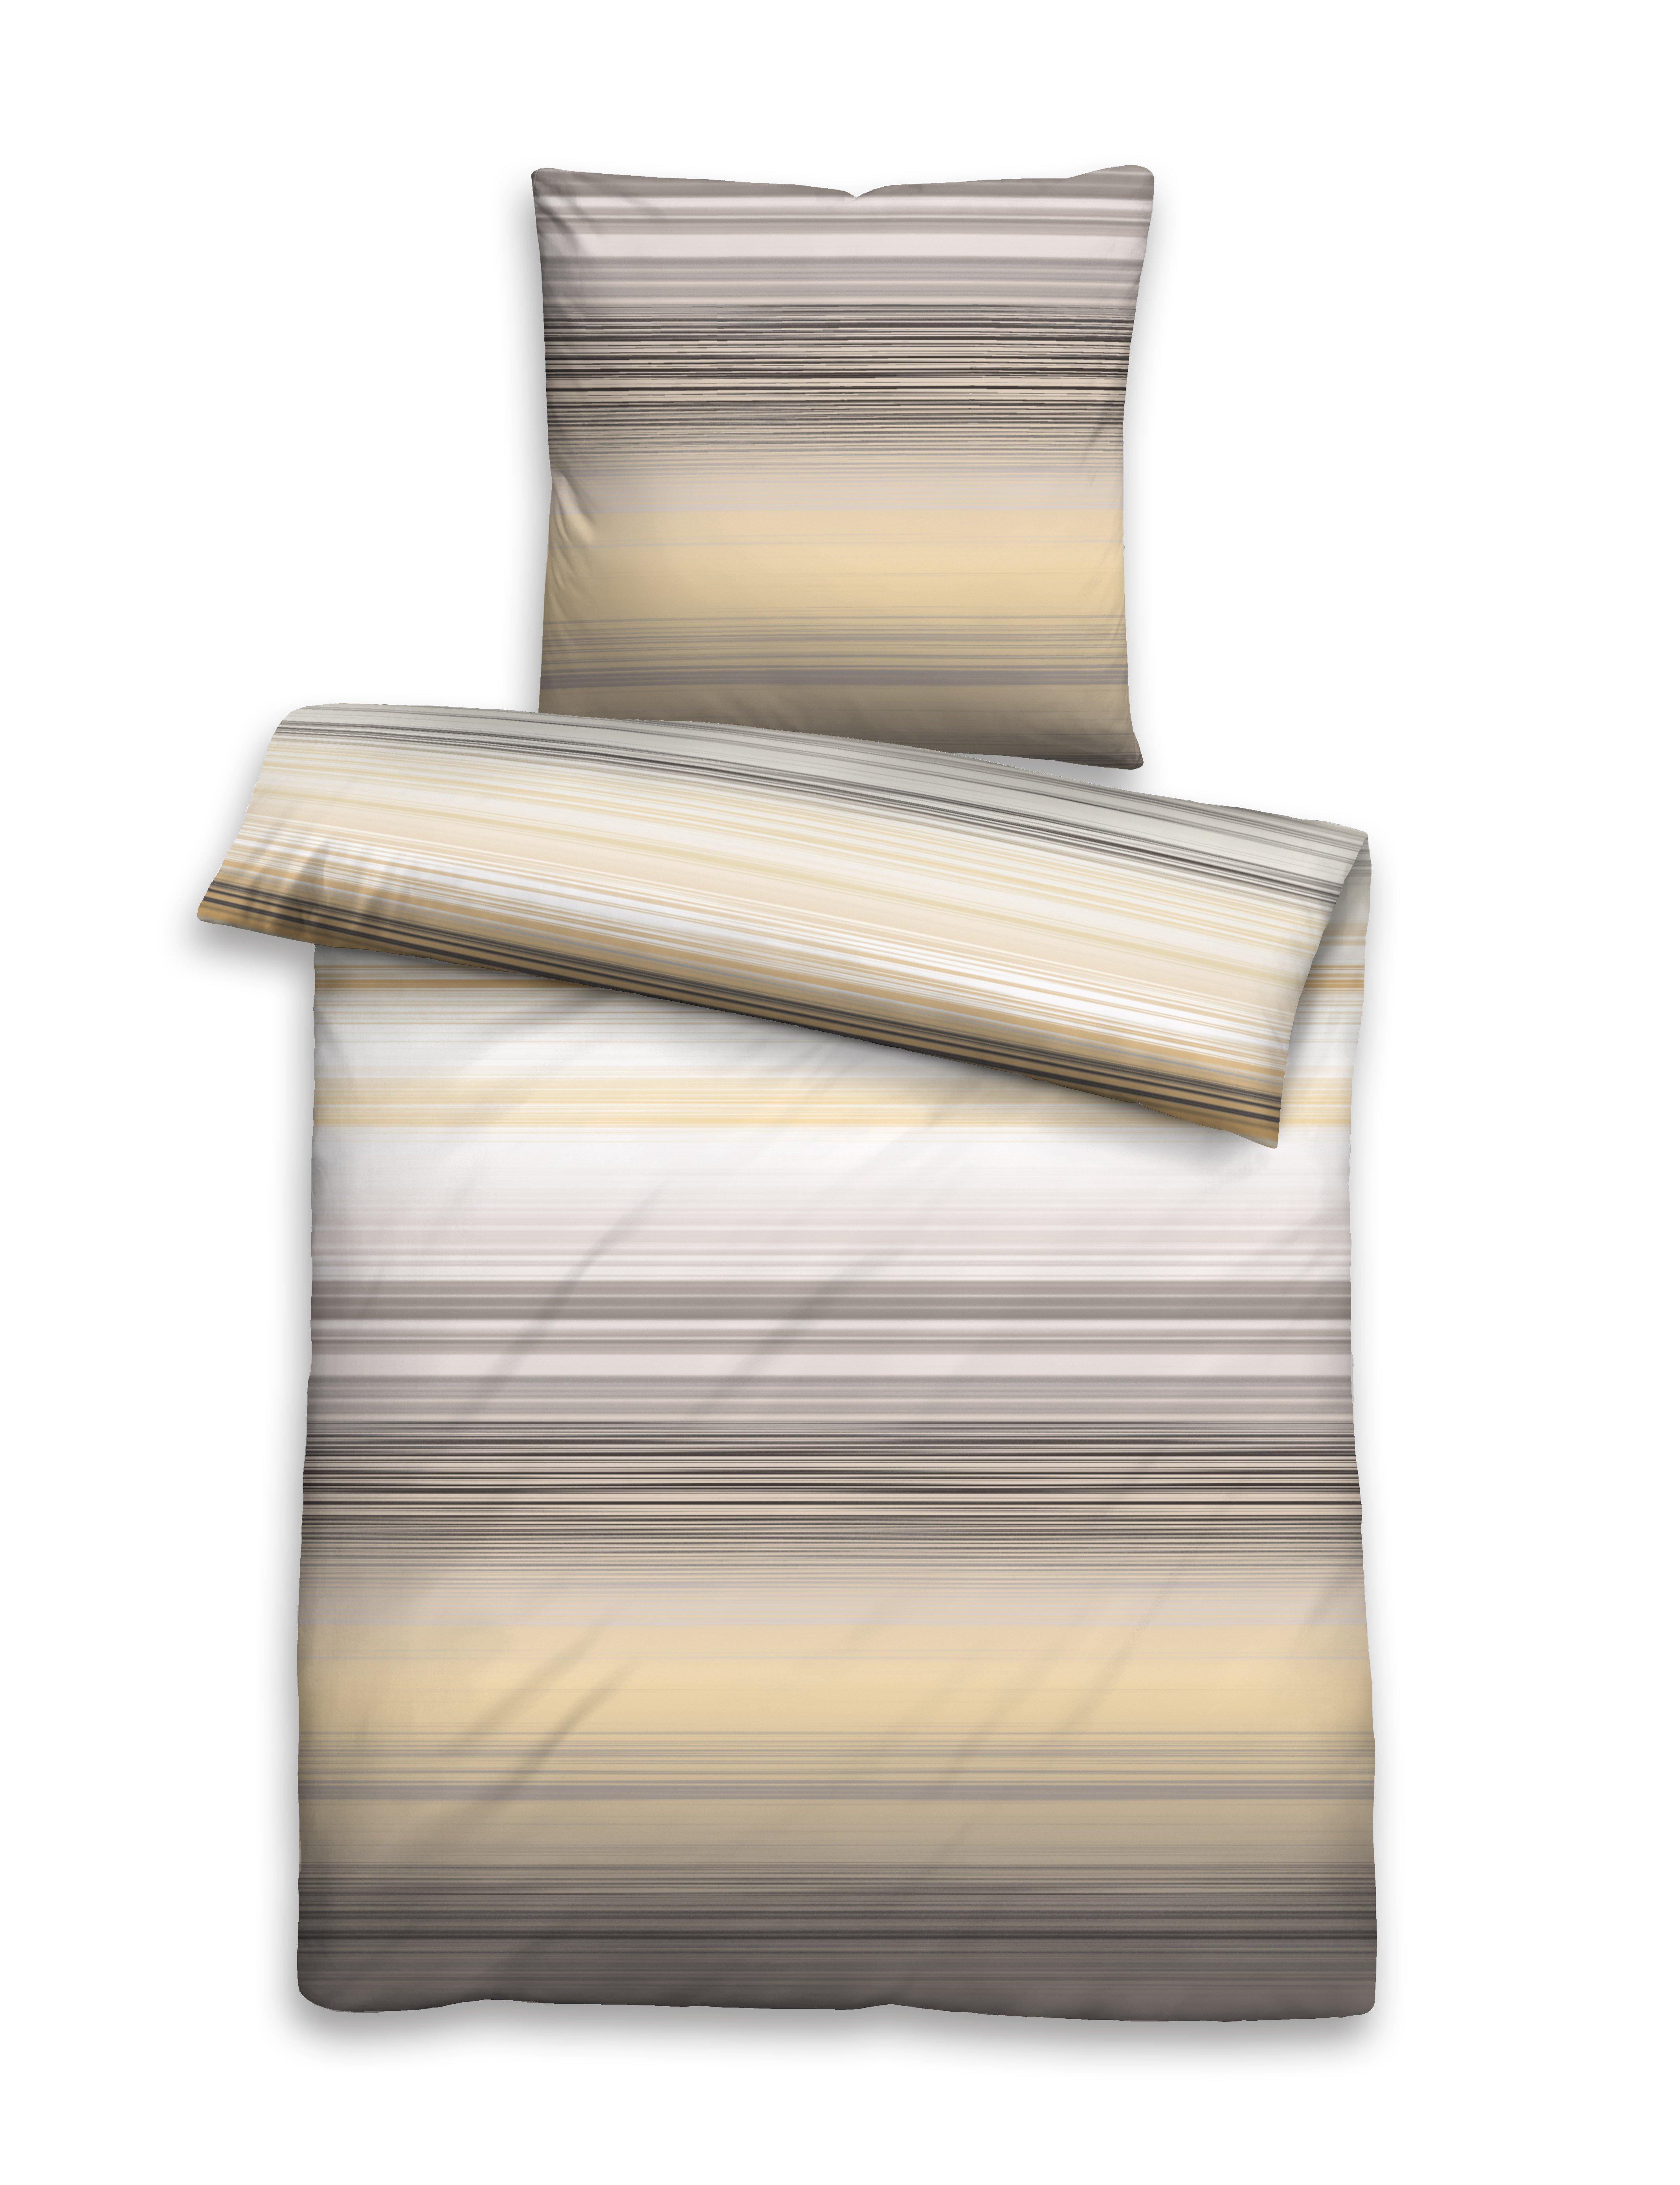 Edel Perkal Bettwäsche 155x220cm taupe